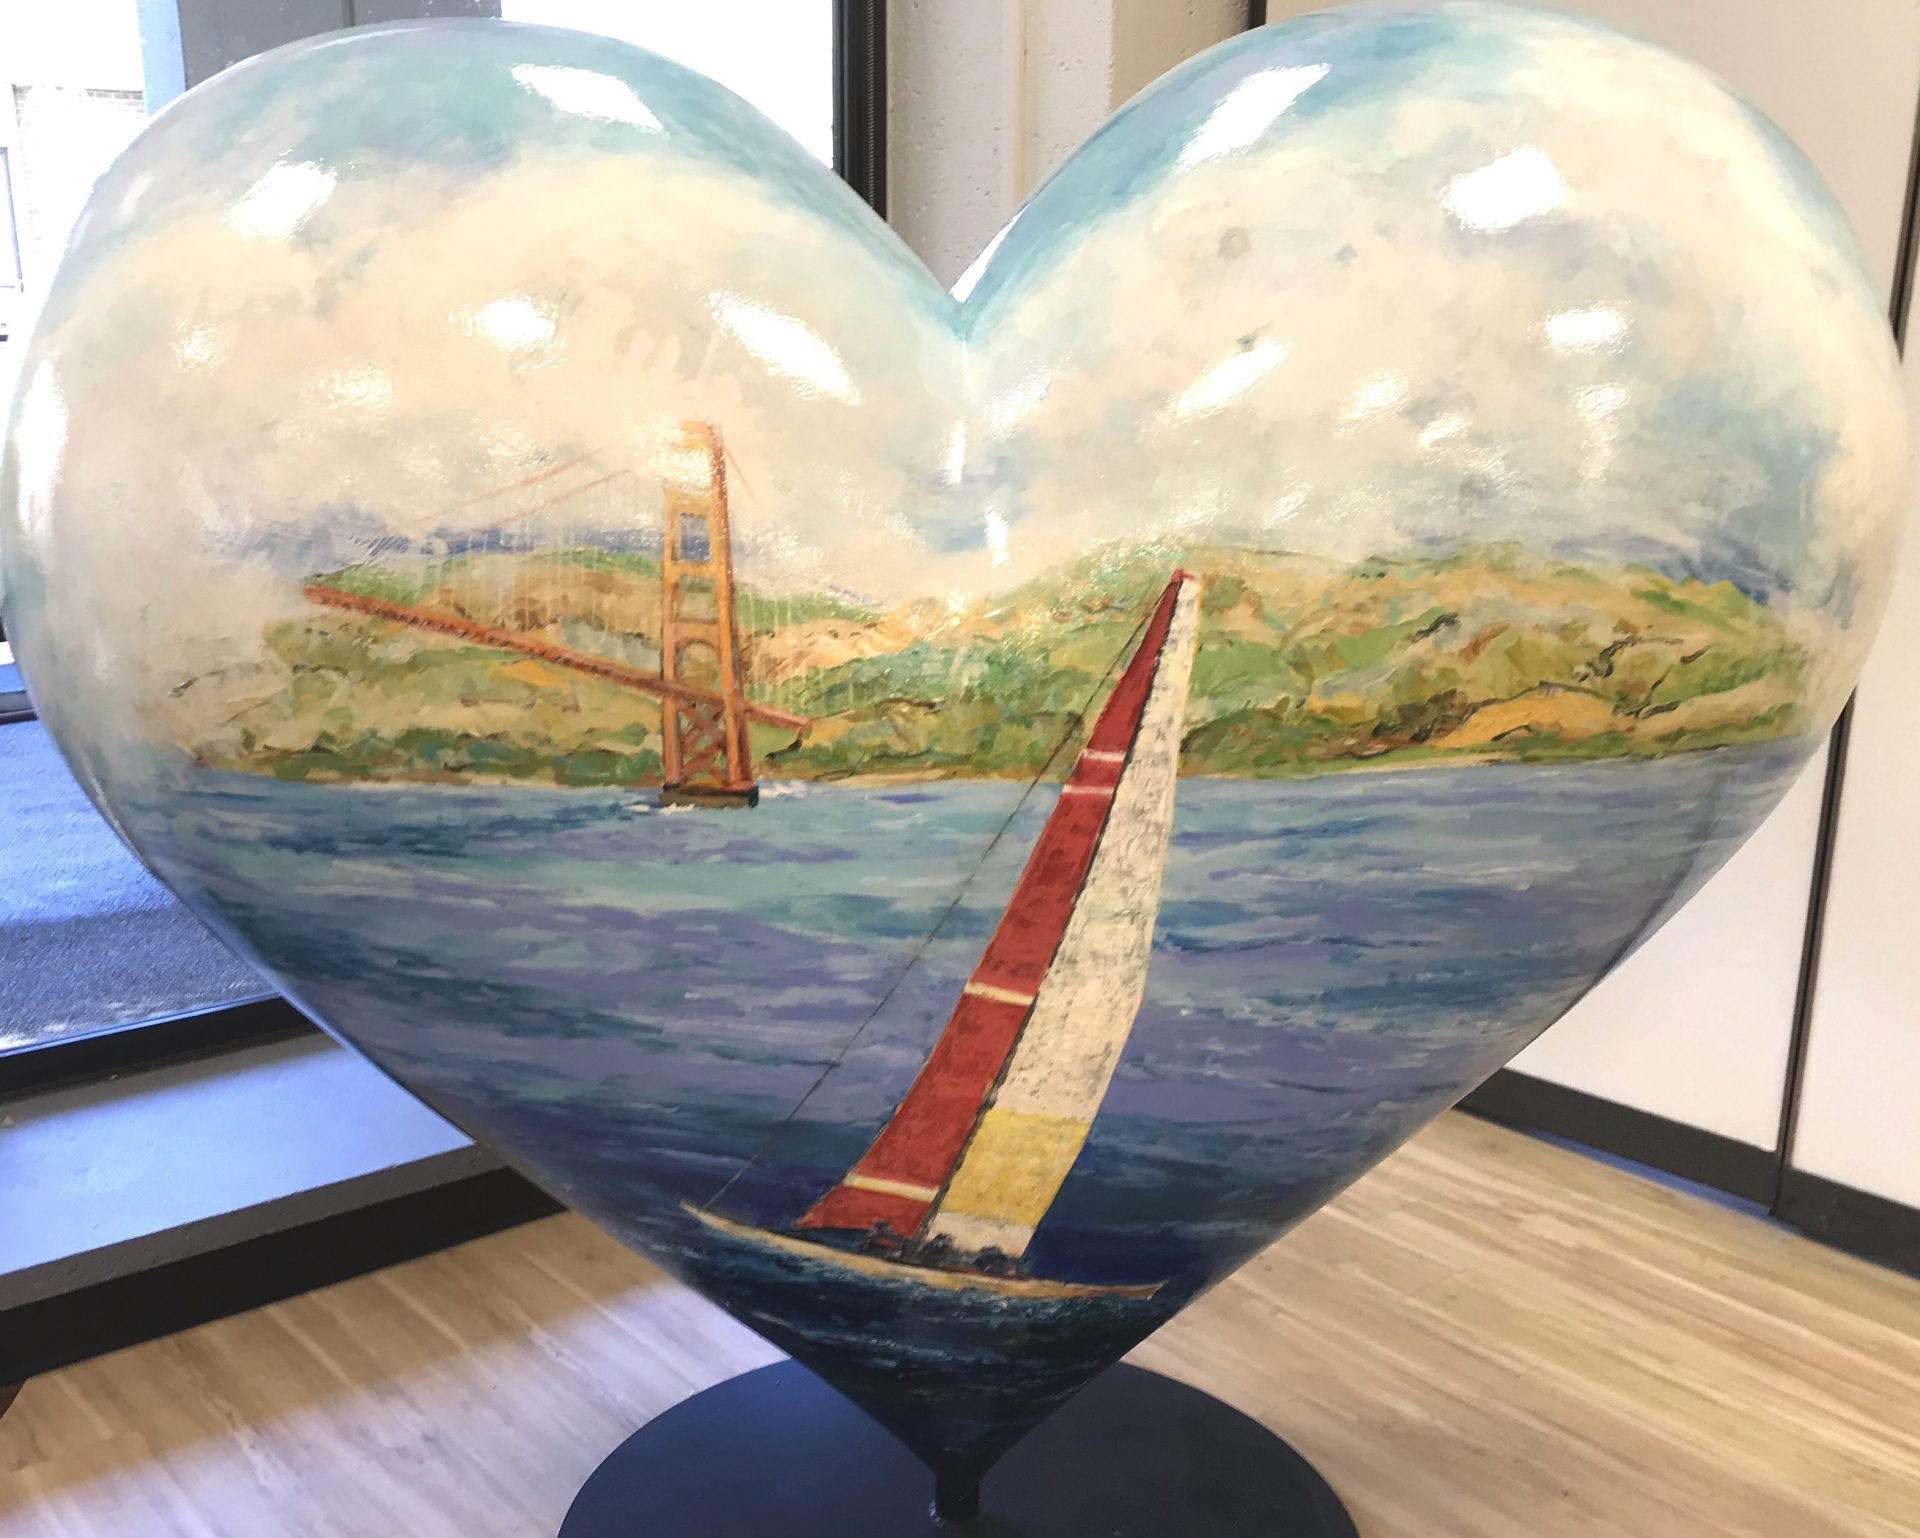 "Hearts of San Francisco - ""Sails of the Bay"" by Marius Starkey at Saint Francis Memorial Hospital"